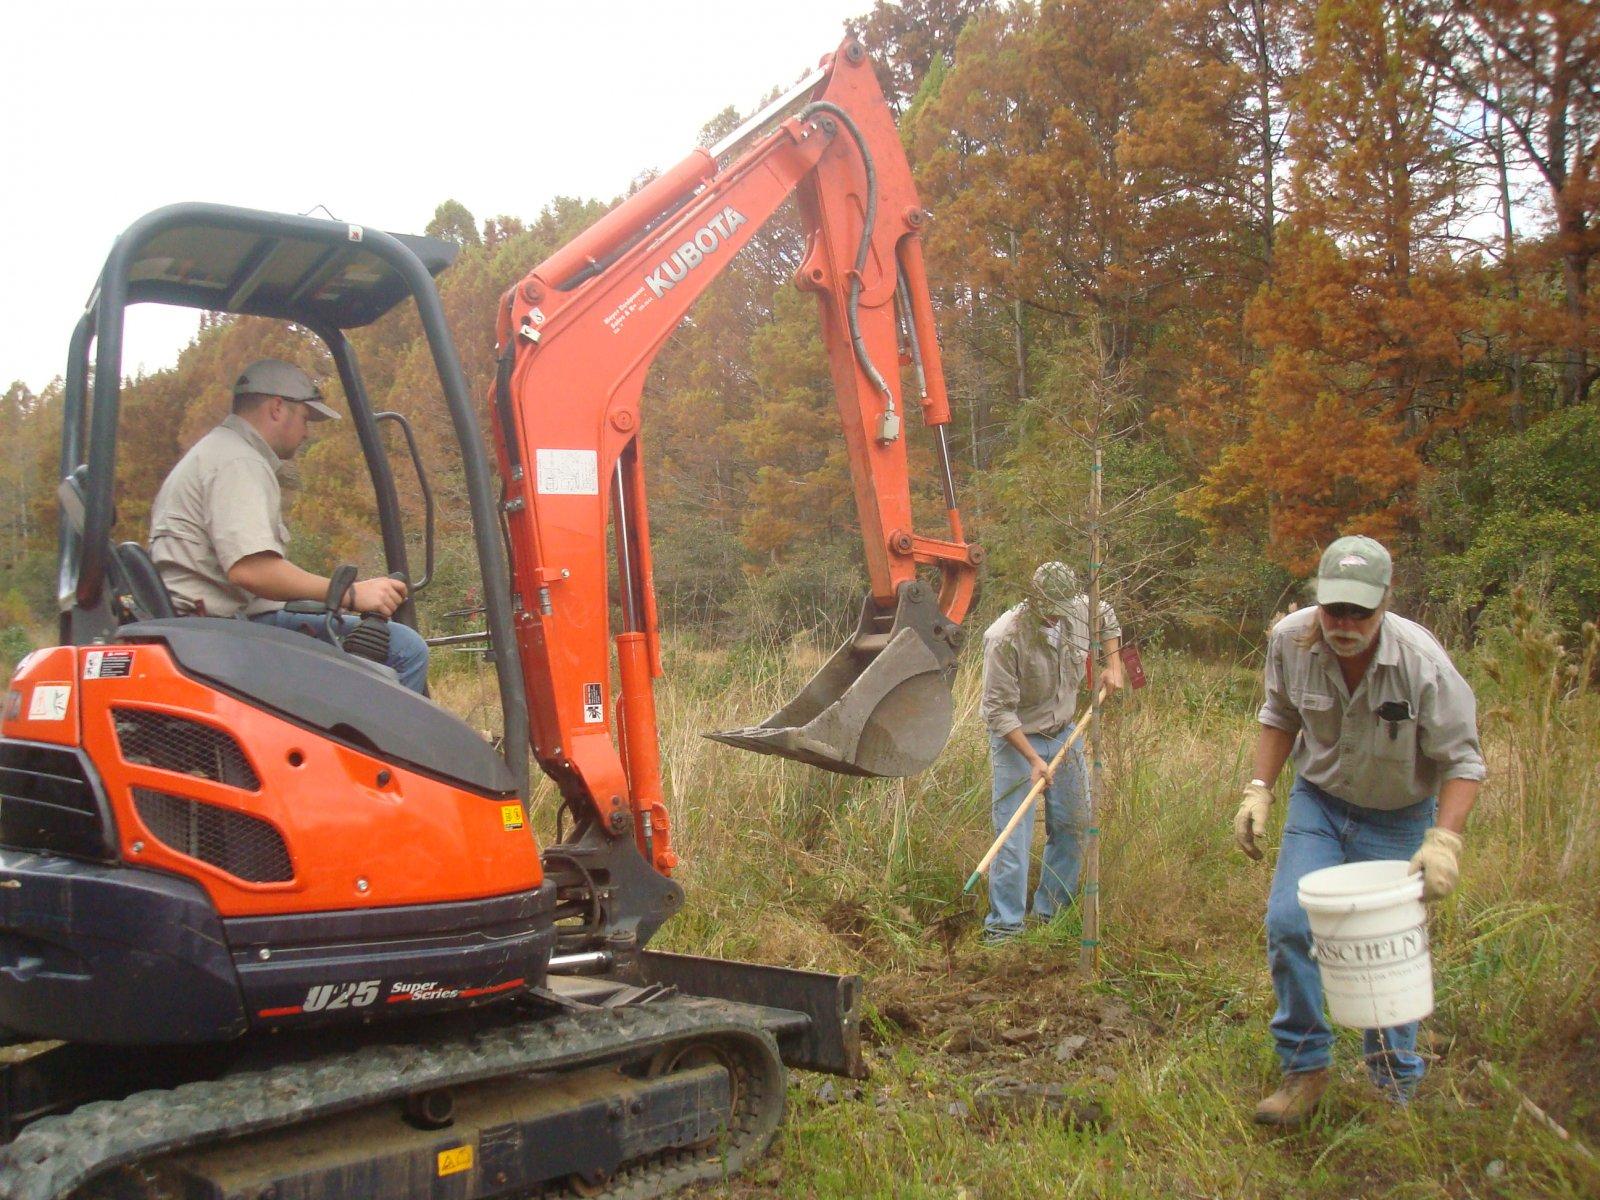 Click image for larger version  Name:Tree Planting Nov 8 12 503.jpg Views:71 Size:402.1 KB ID:172544